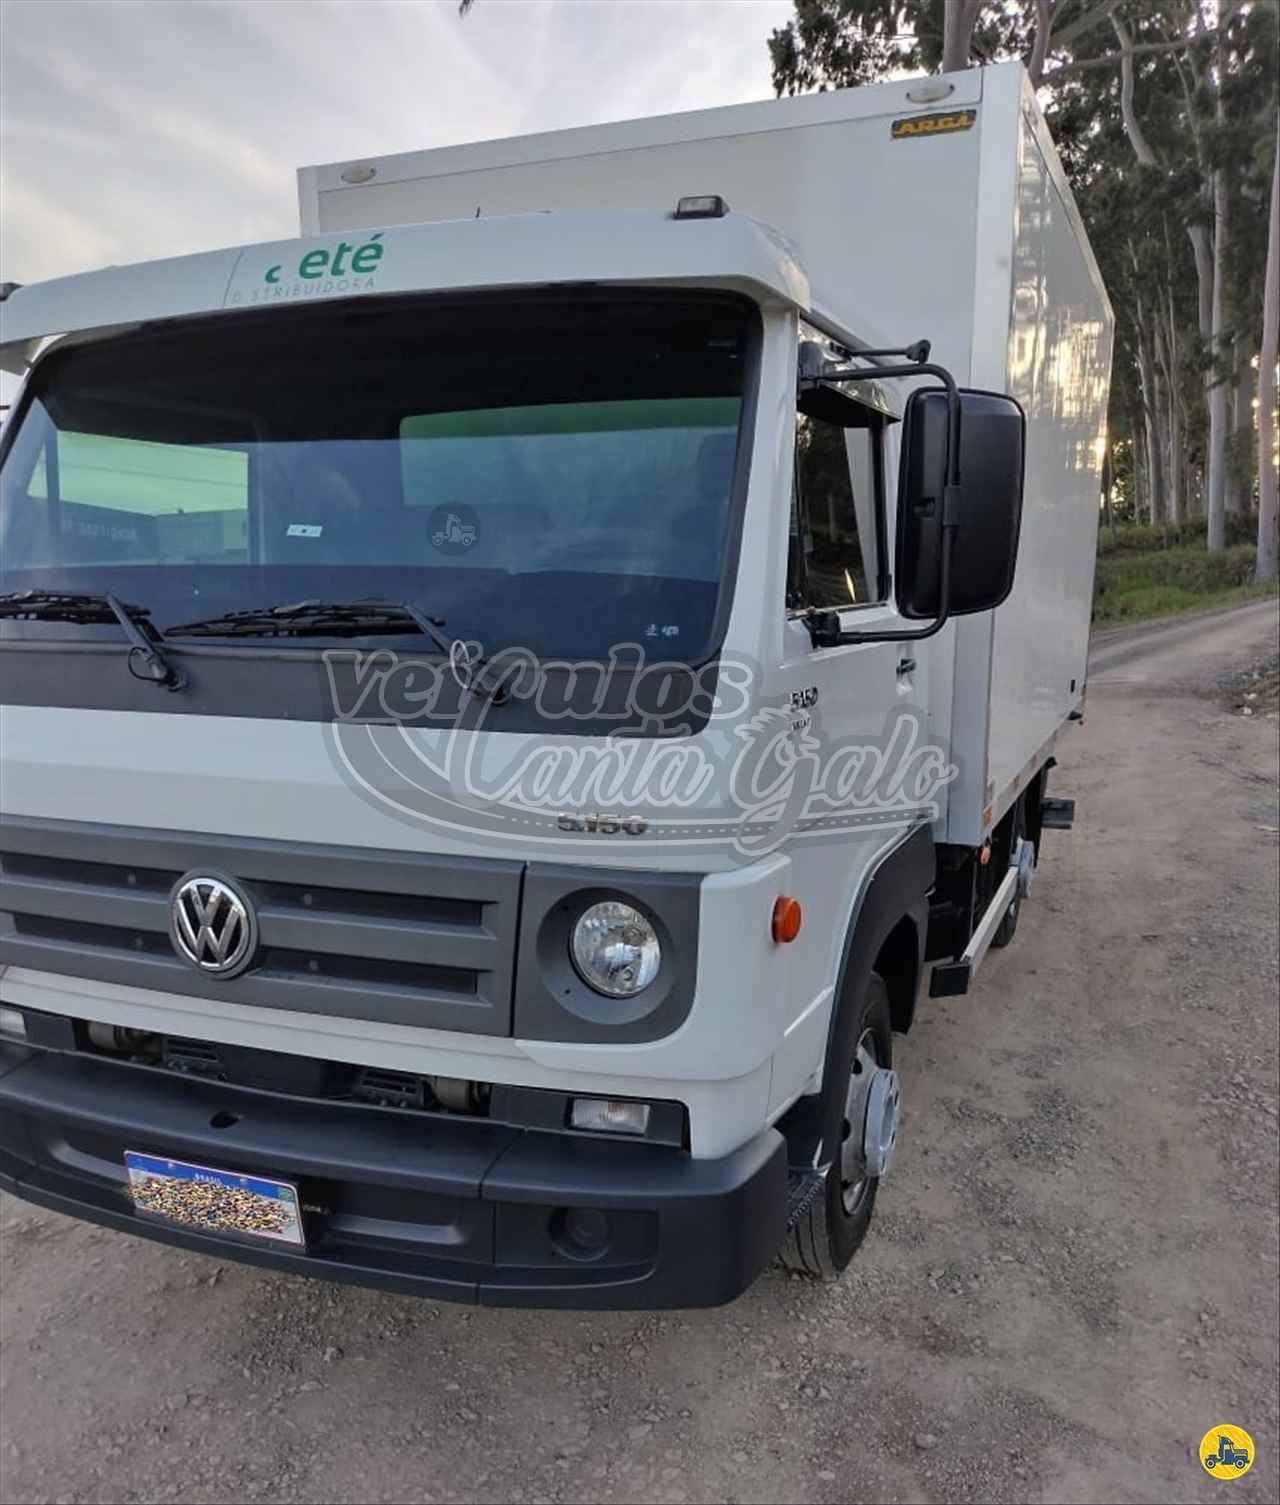 CAMINHAO VOLKSWAGEN VW 5150 Baú Térmico 3/4 4x2 Veículos Canta Galo RIO DO SUL SANTA CATARINA SC